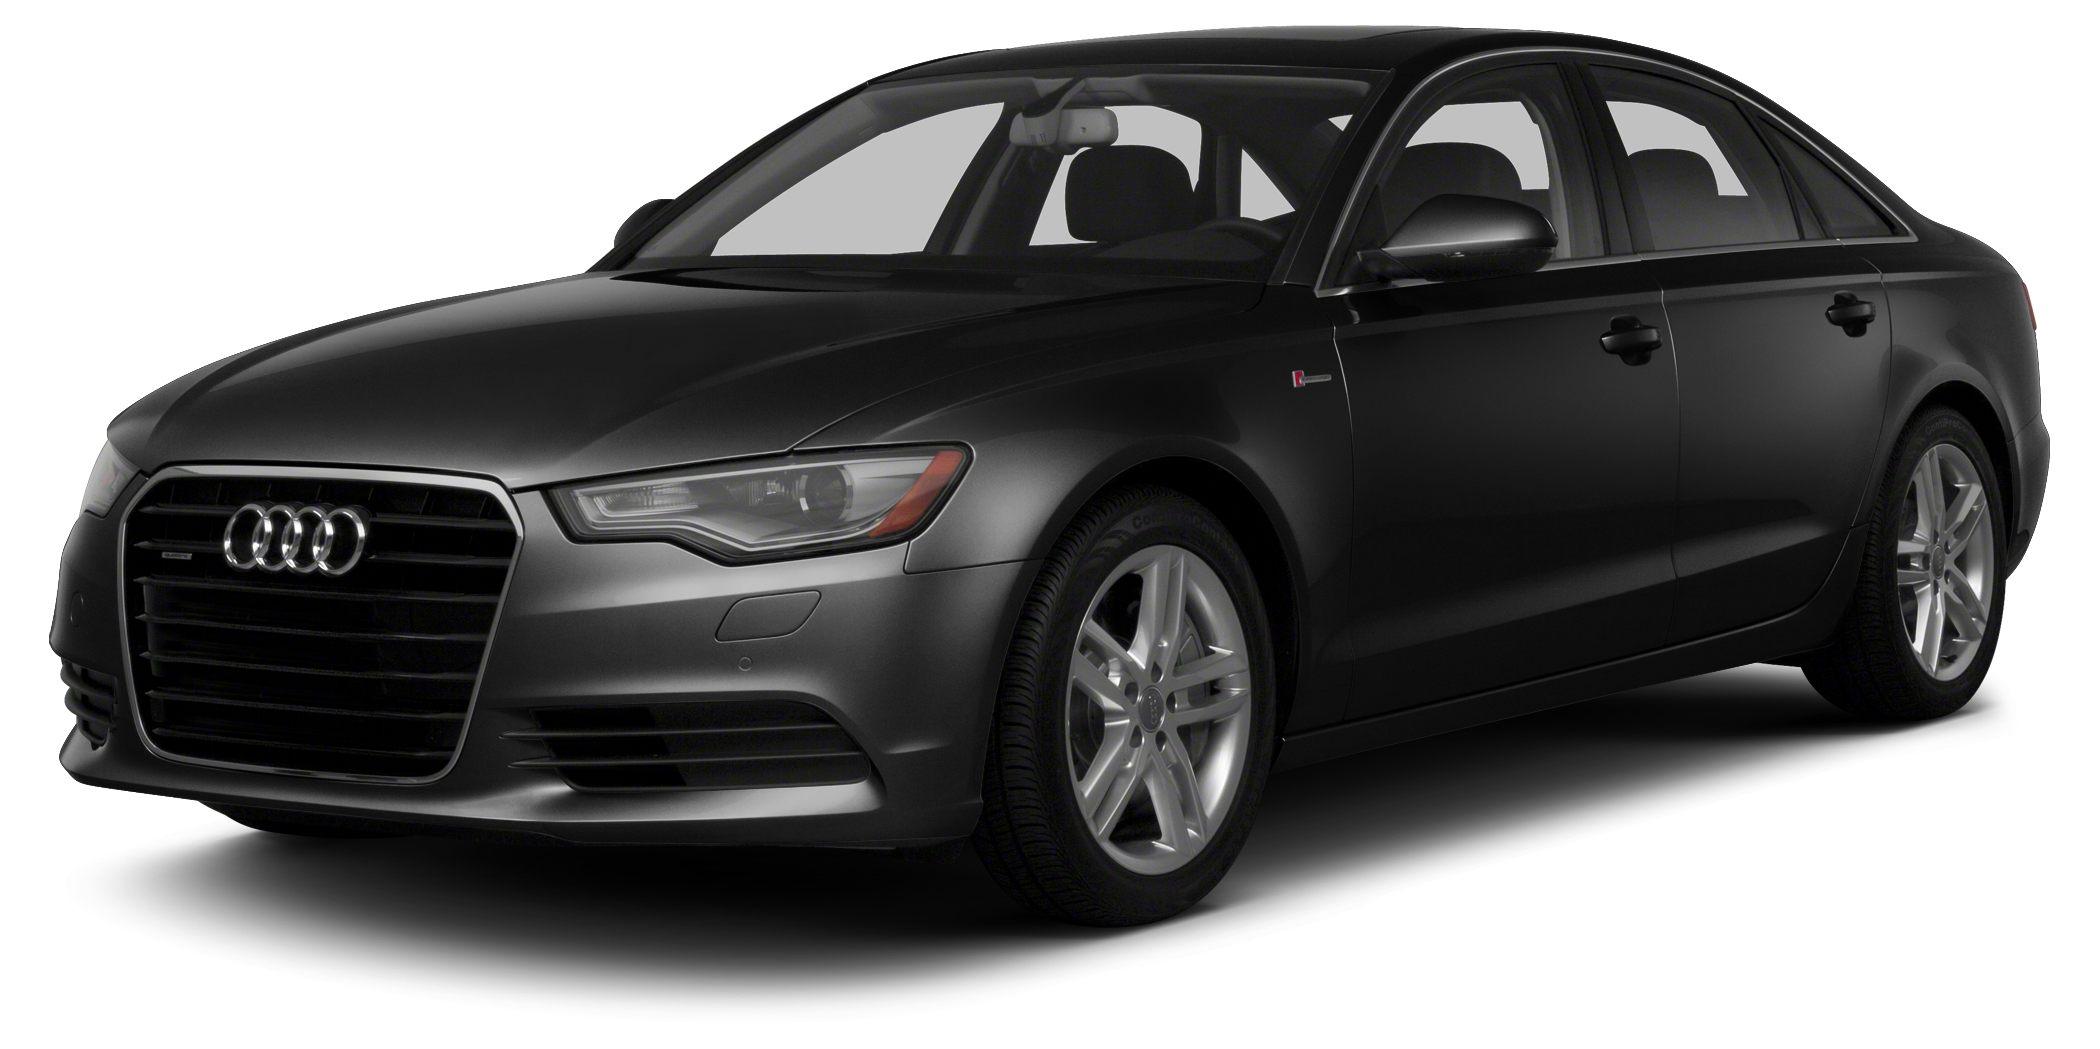 2013 Audi A6 20T quattro Premium QUATTRO BACKUP CAMERA NAVIGATION BLIND SPOT MONITIOR UPGRADE